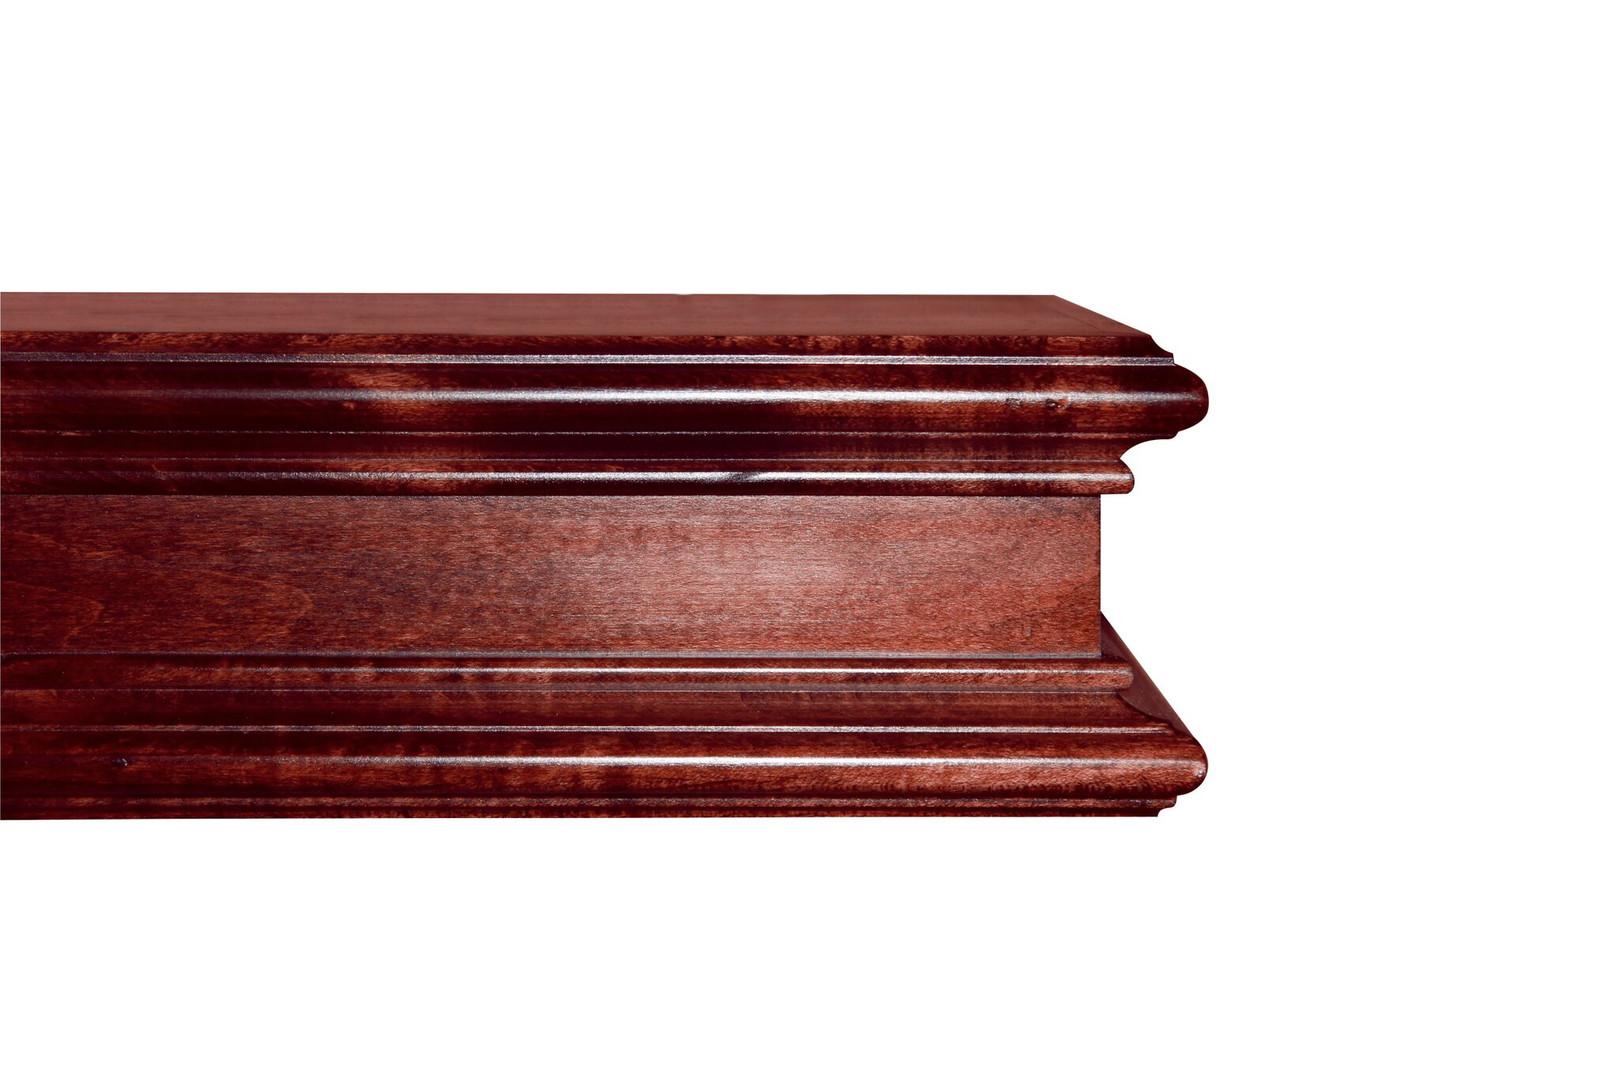 Mahogany-Shelf-Classic-2-rose.jpg